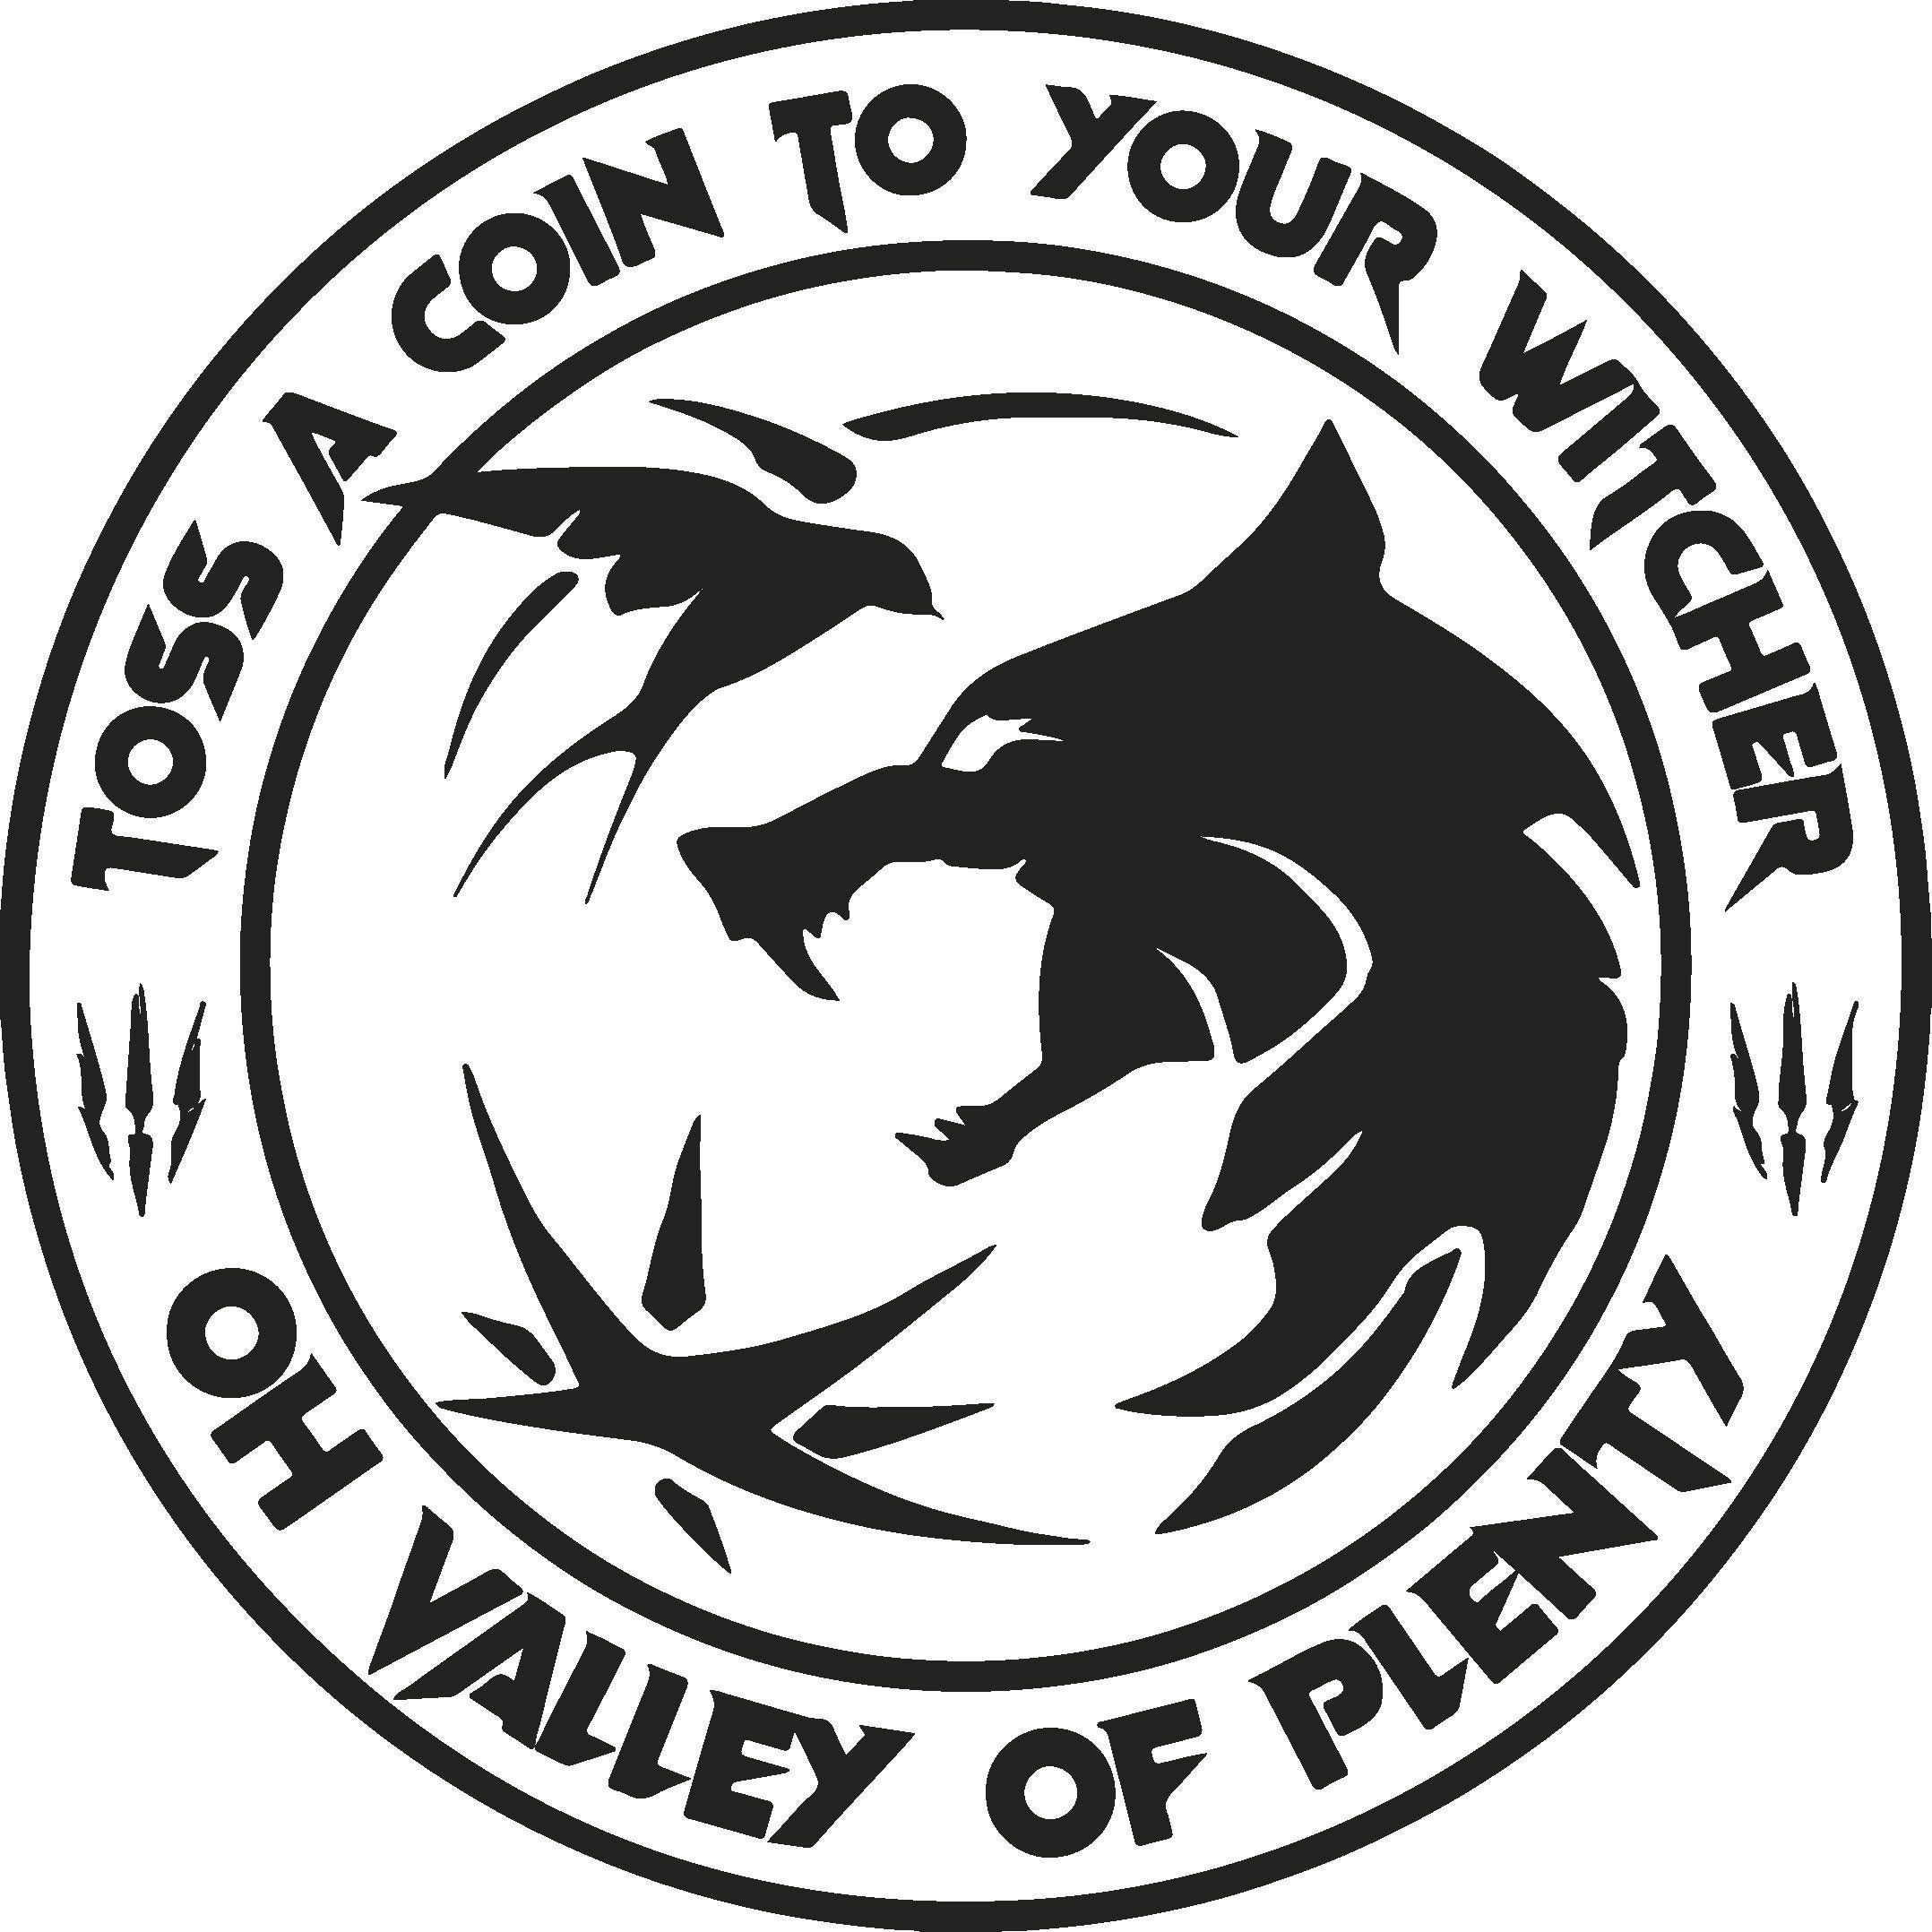 Witcher Svg Https Www Etsy Com Shop Cathysbyjason Ref Seller Platform Mcnav The Witcher Sticker Patches Star Svg